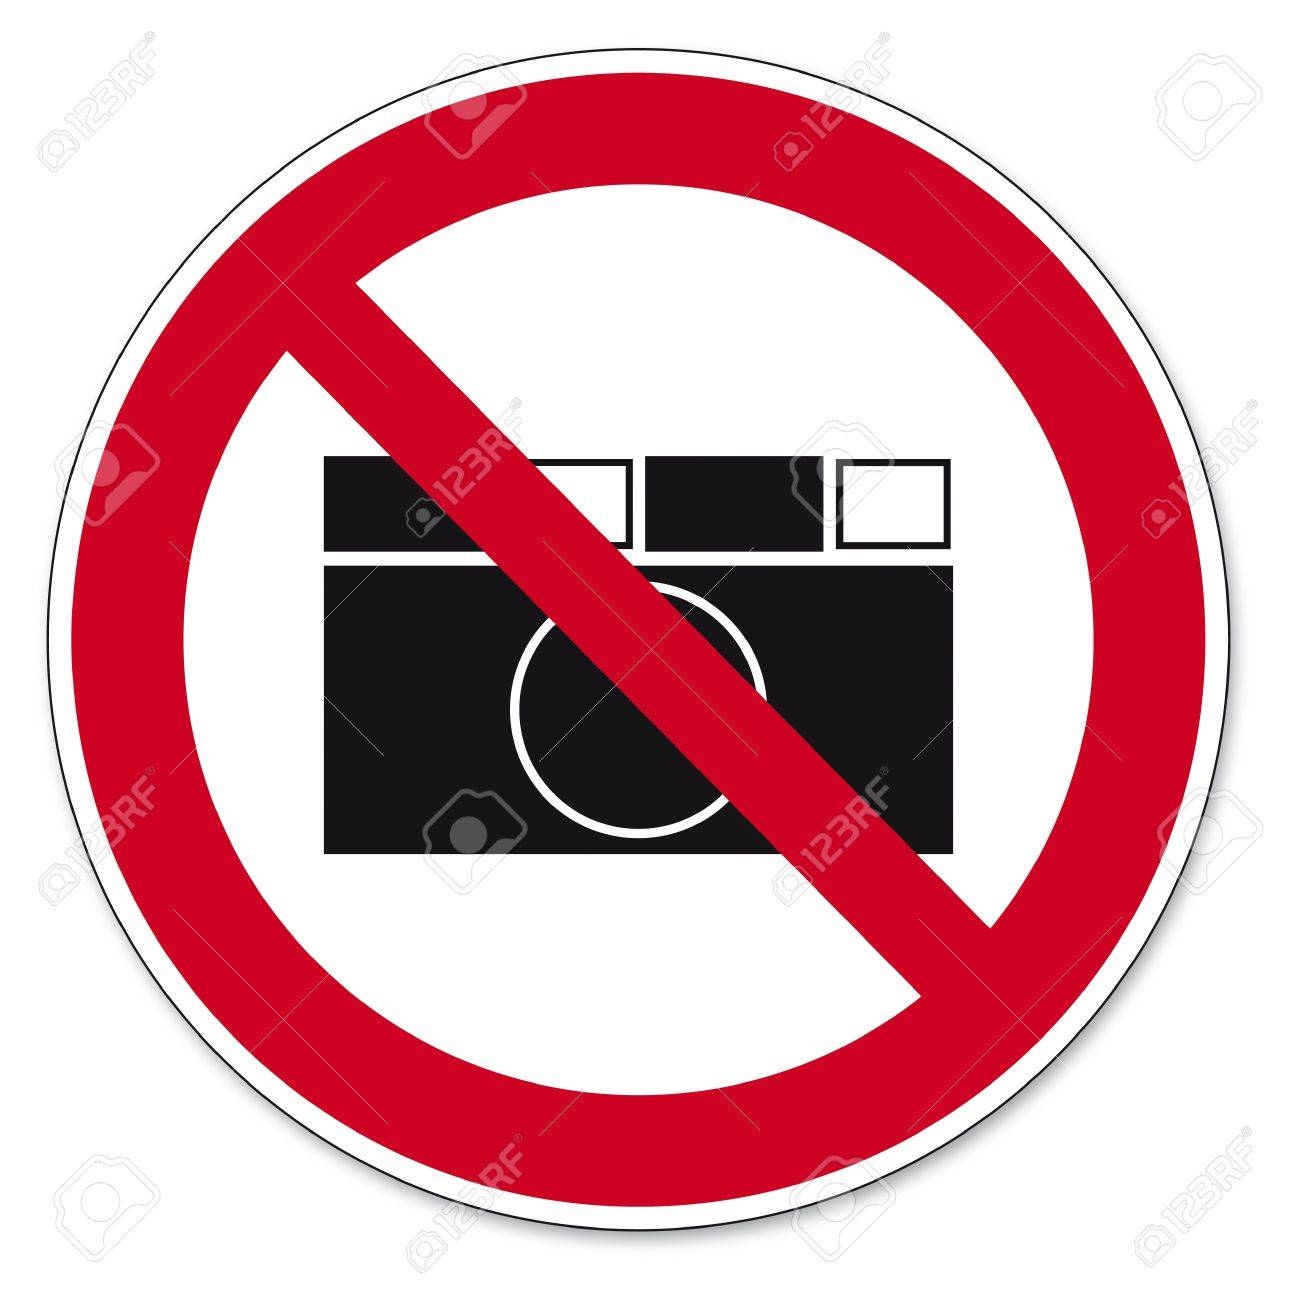 Prohibition signs BGV icon pictogram photographing prohibited paparazzi Stock Vector - 14513099